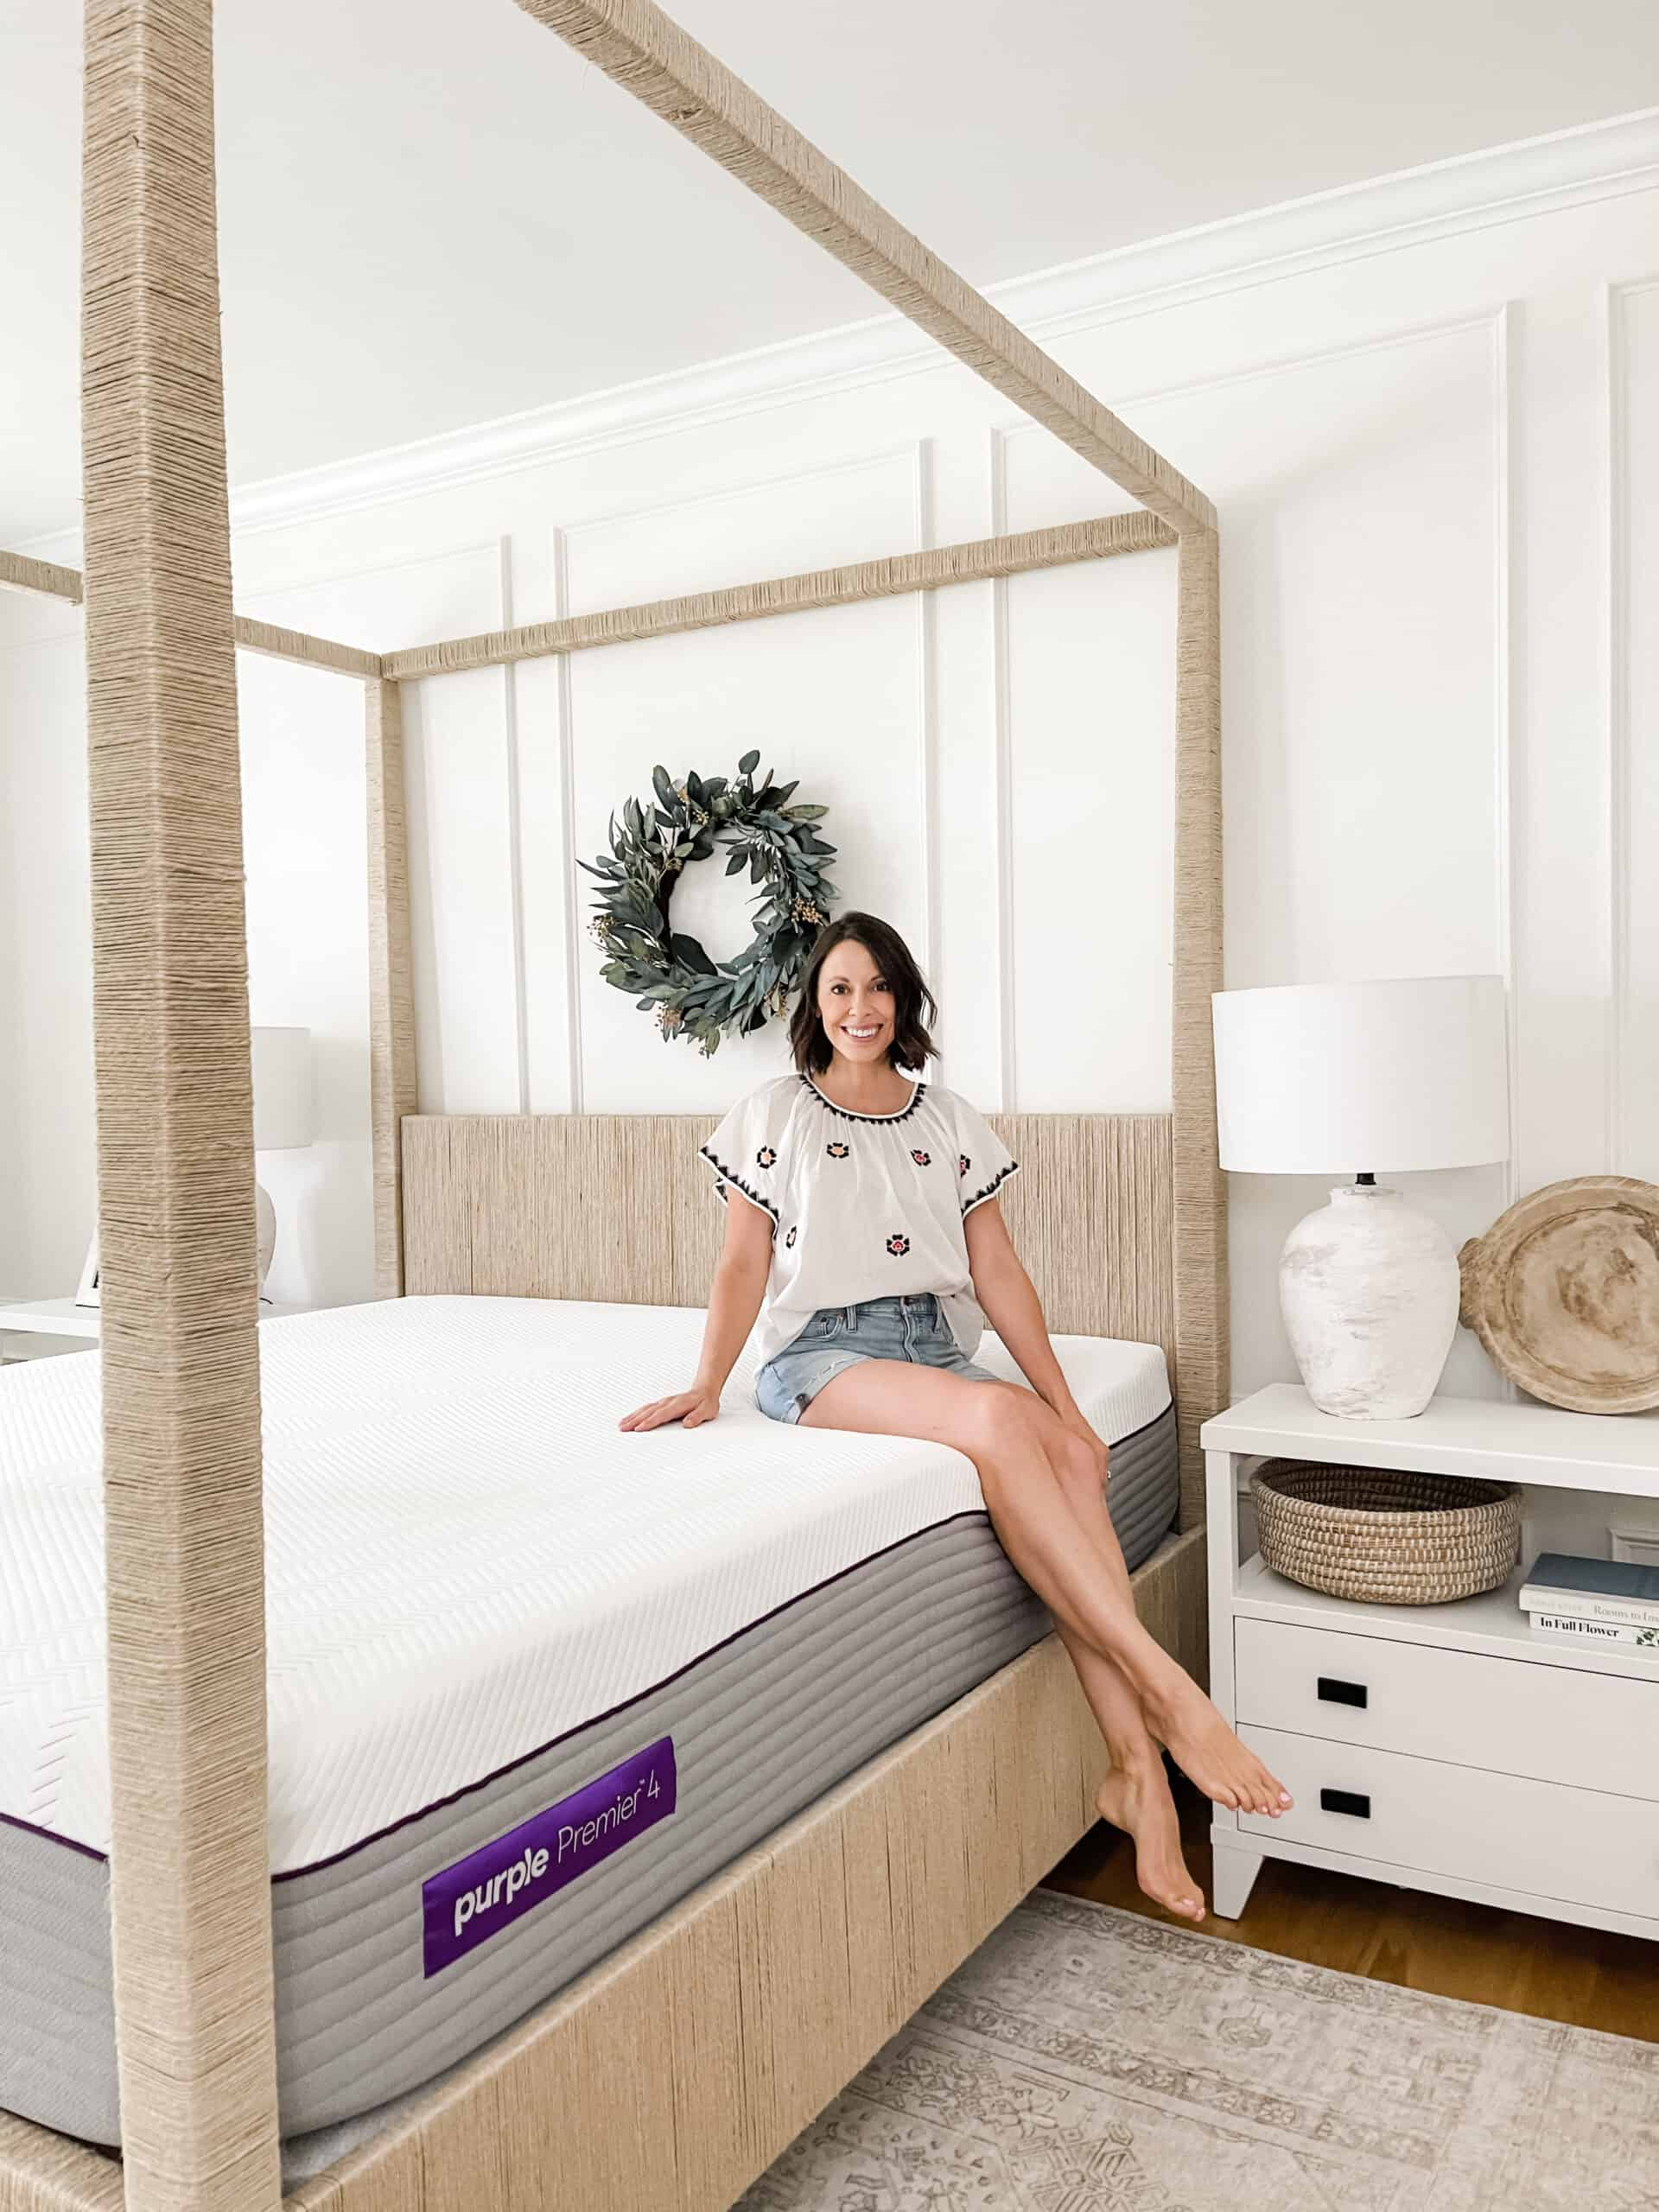 Purple mattress review in master bedroom